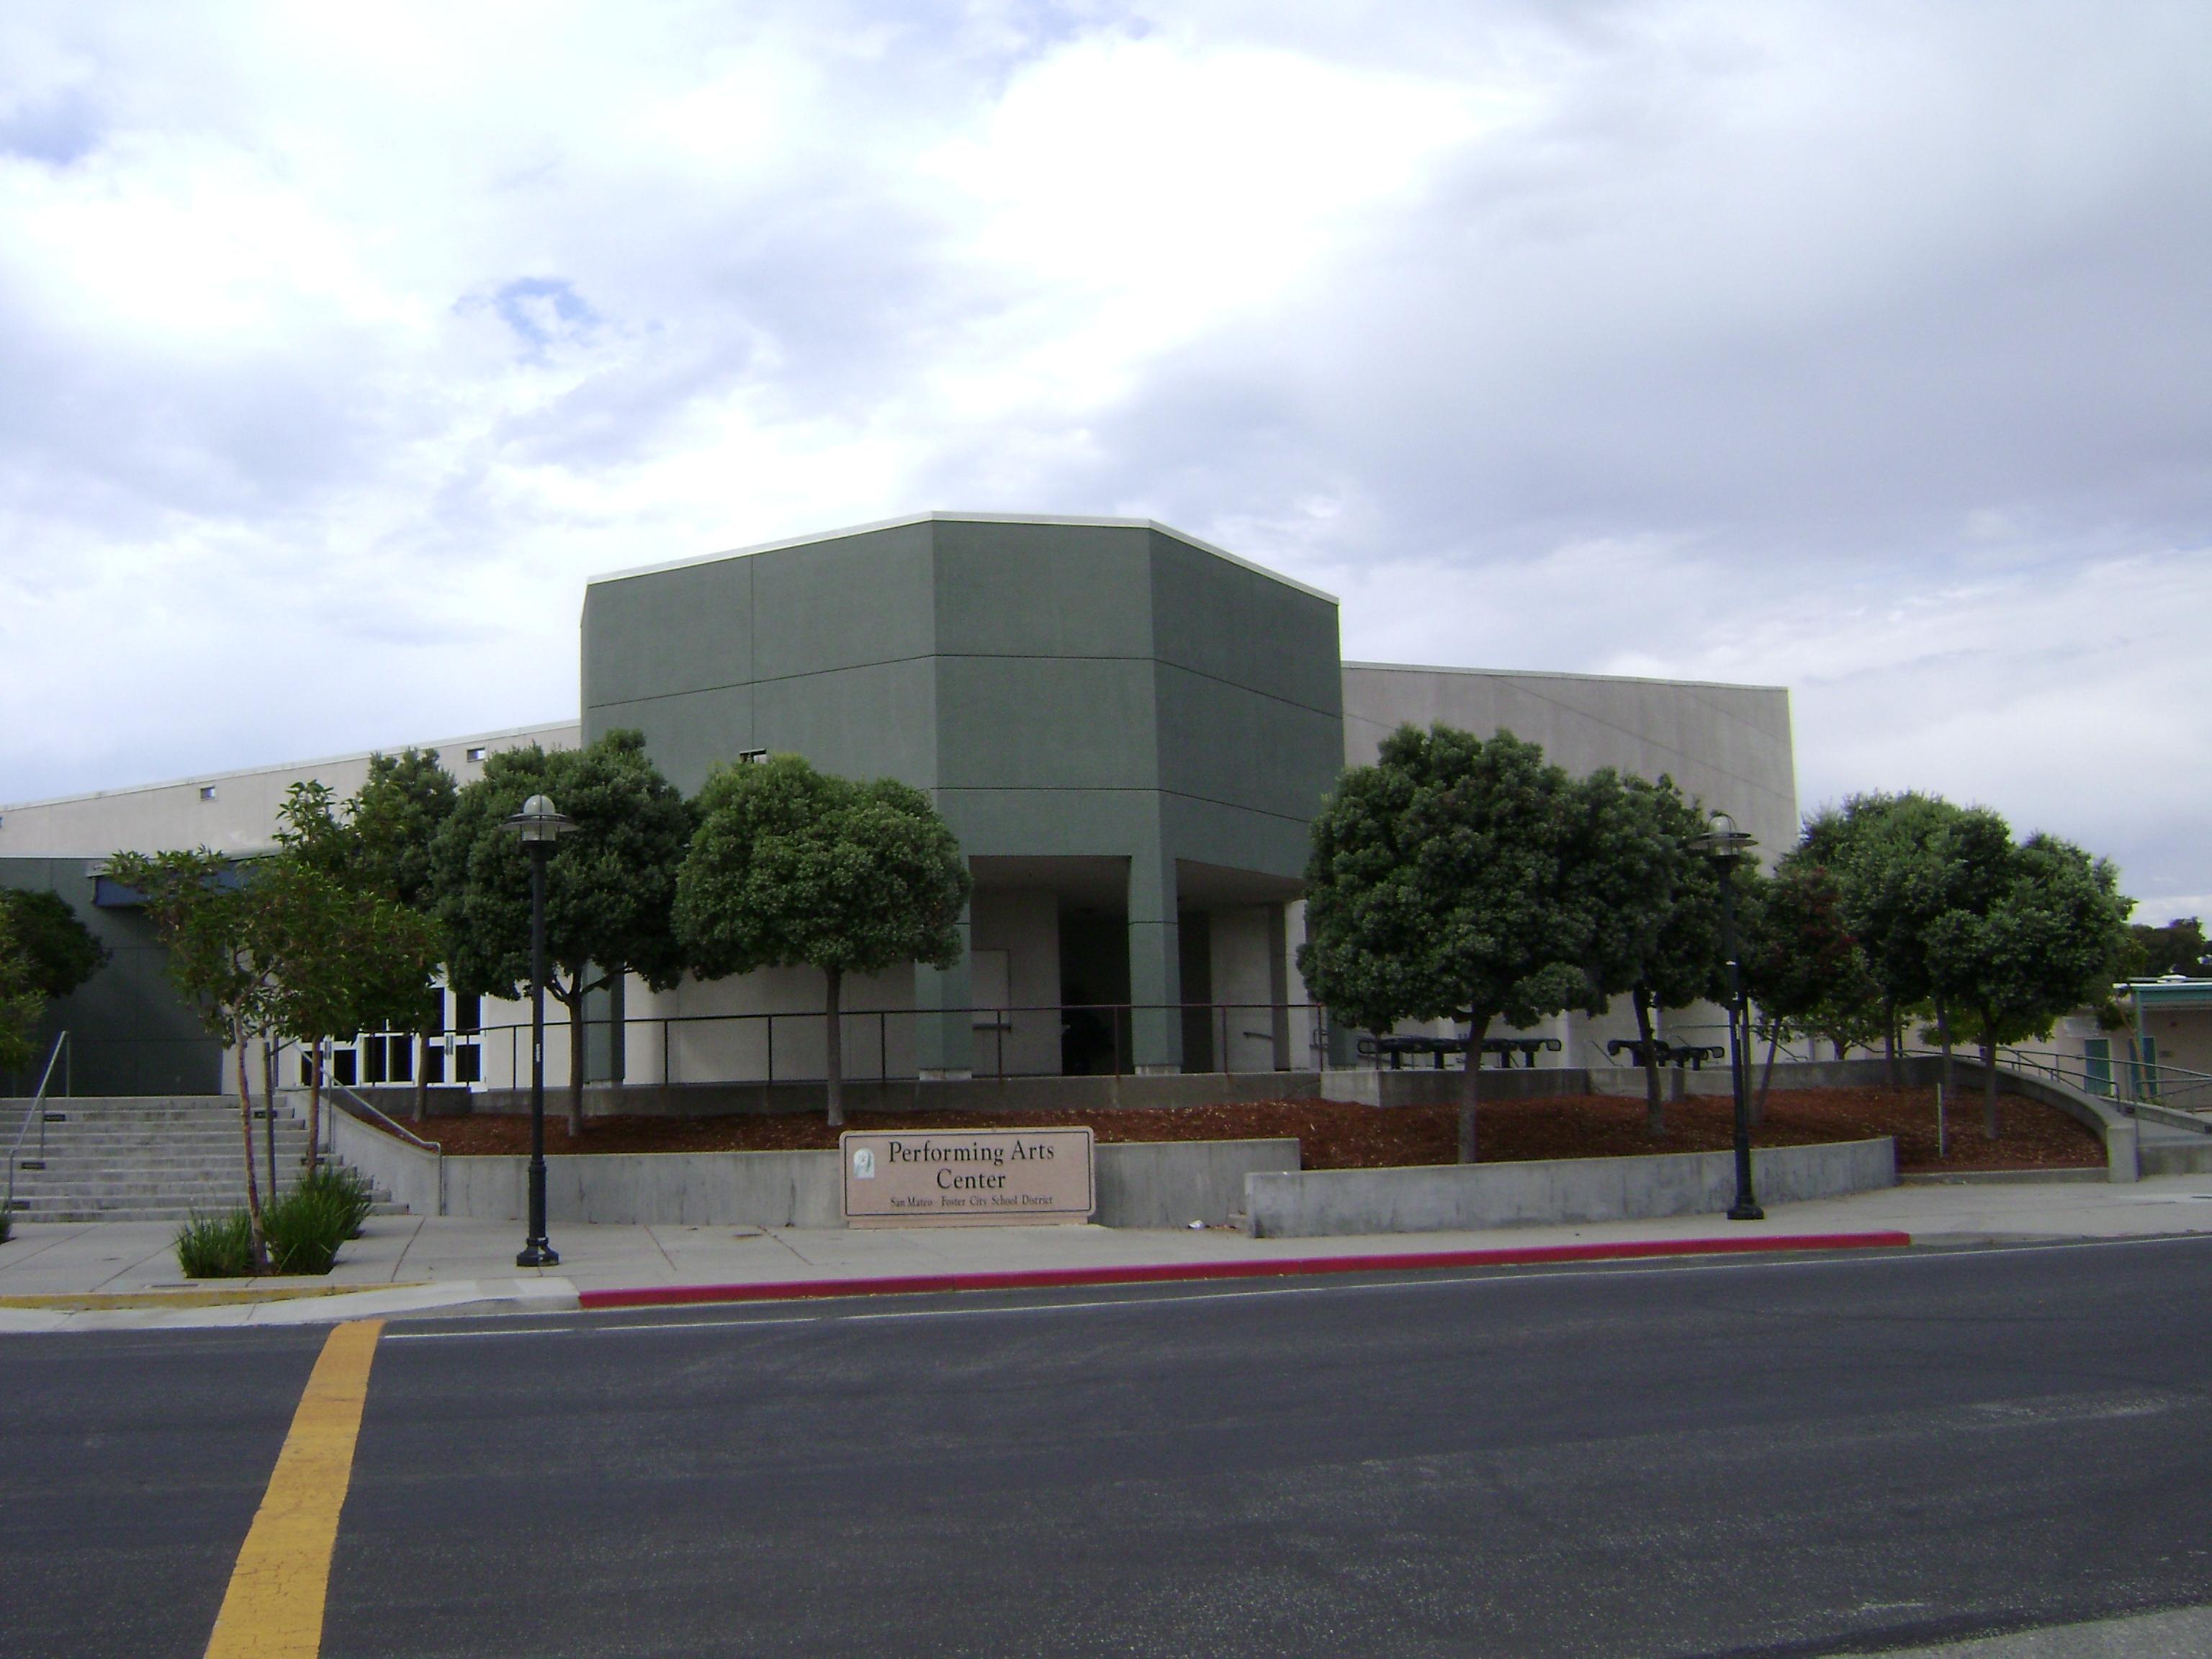 San Mateo Ca >> File:Performing Arts Center, San Mateo Foster City School District.JPG - Wikimedia Commons